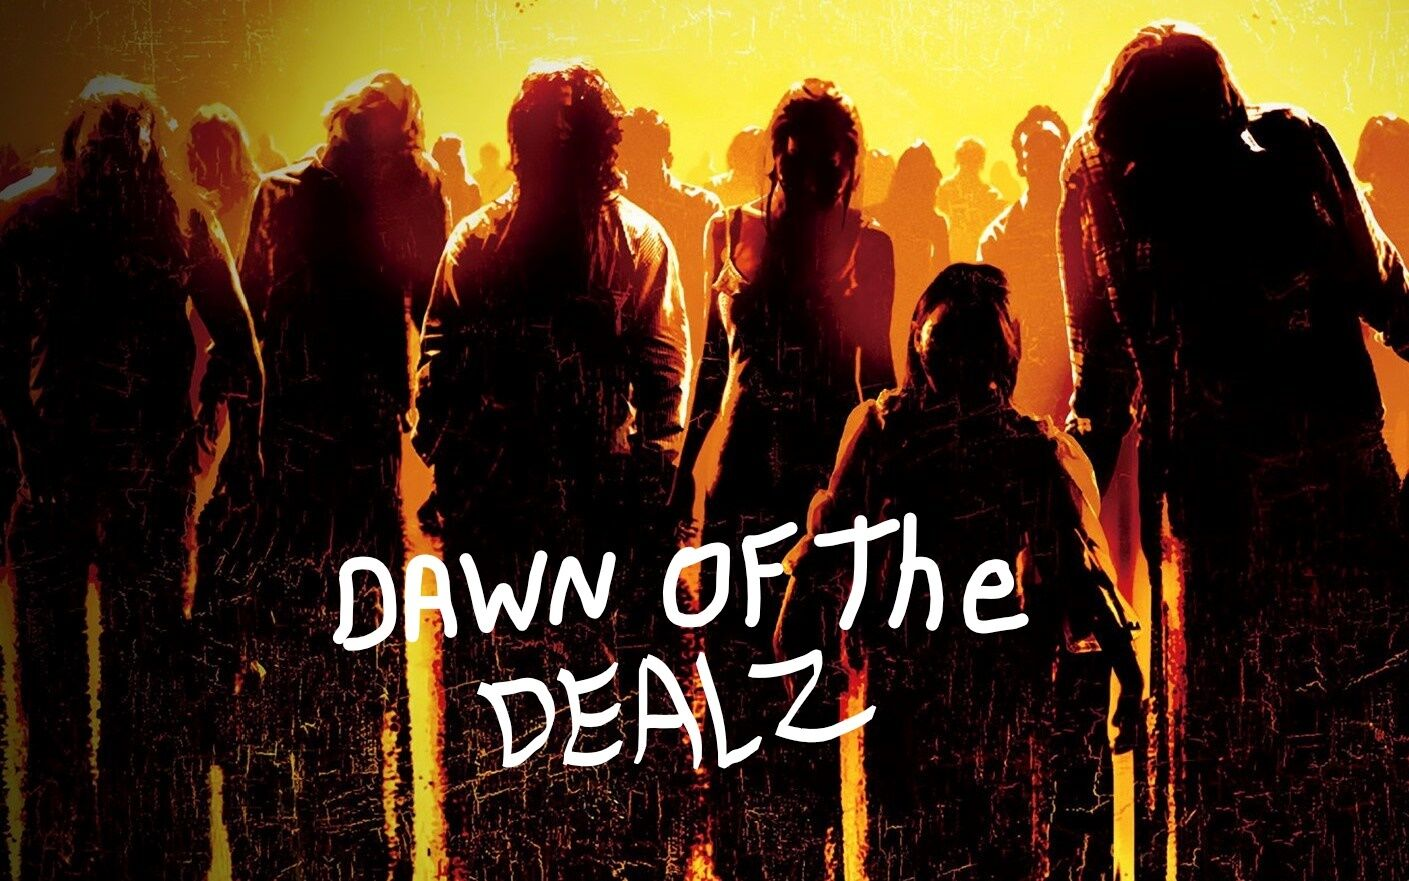 dawn of the dealz !!!!!